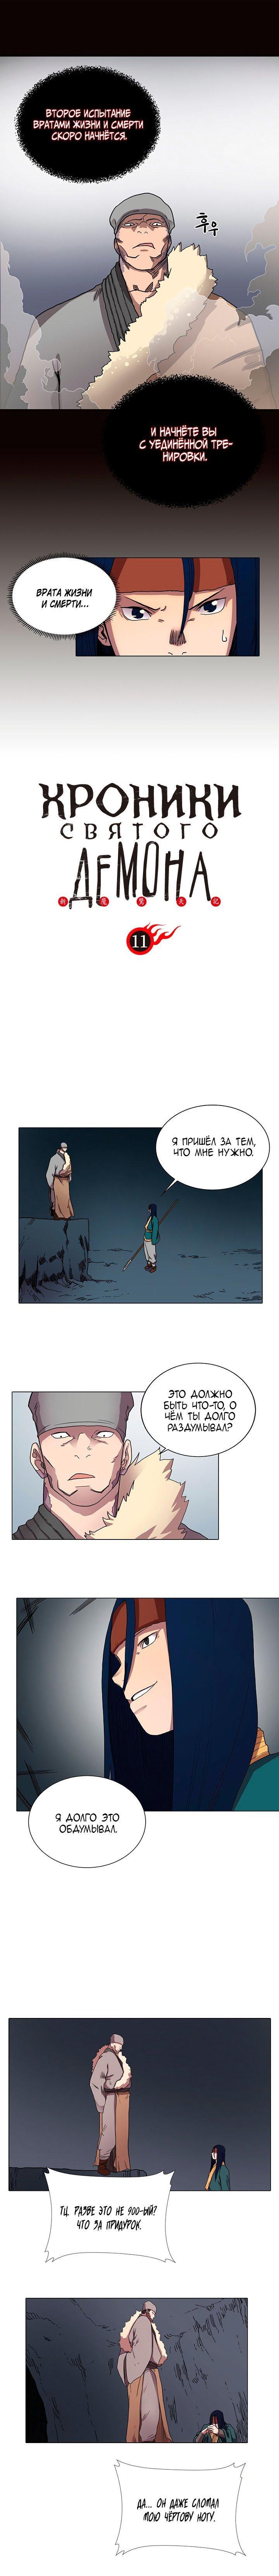 Манга Хроники Святого Демона - Глава 11 Страница 1